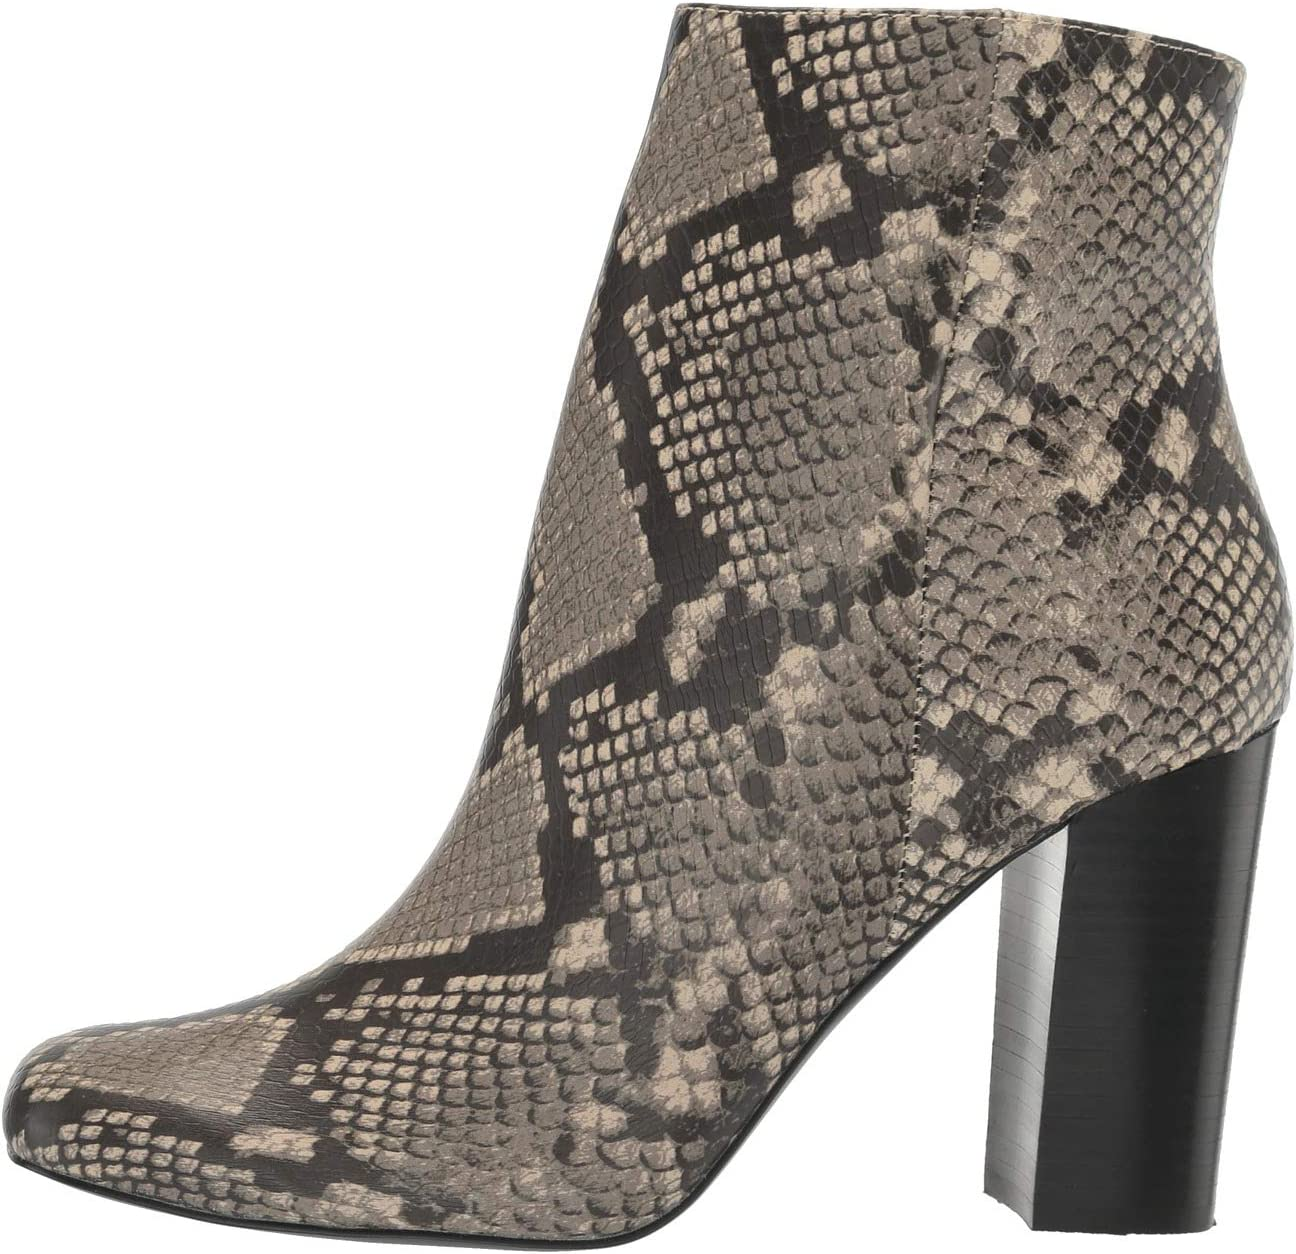 Steve Madden Pixie Bootie | Women's shoes | 2020 Newest